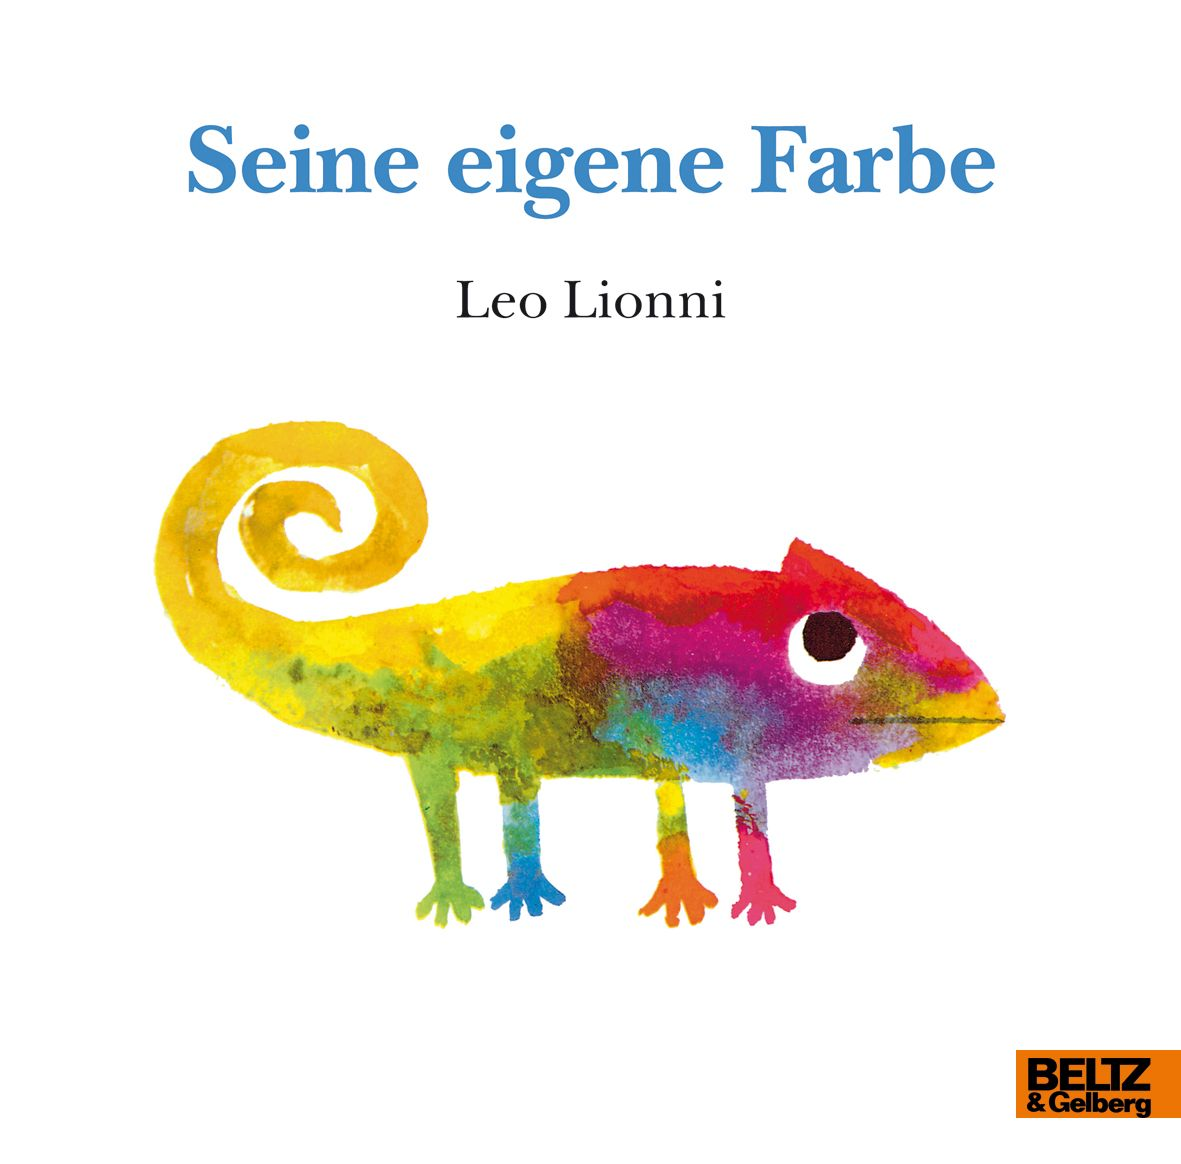 His own color – Leo Lionni